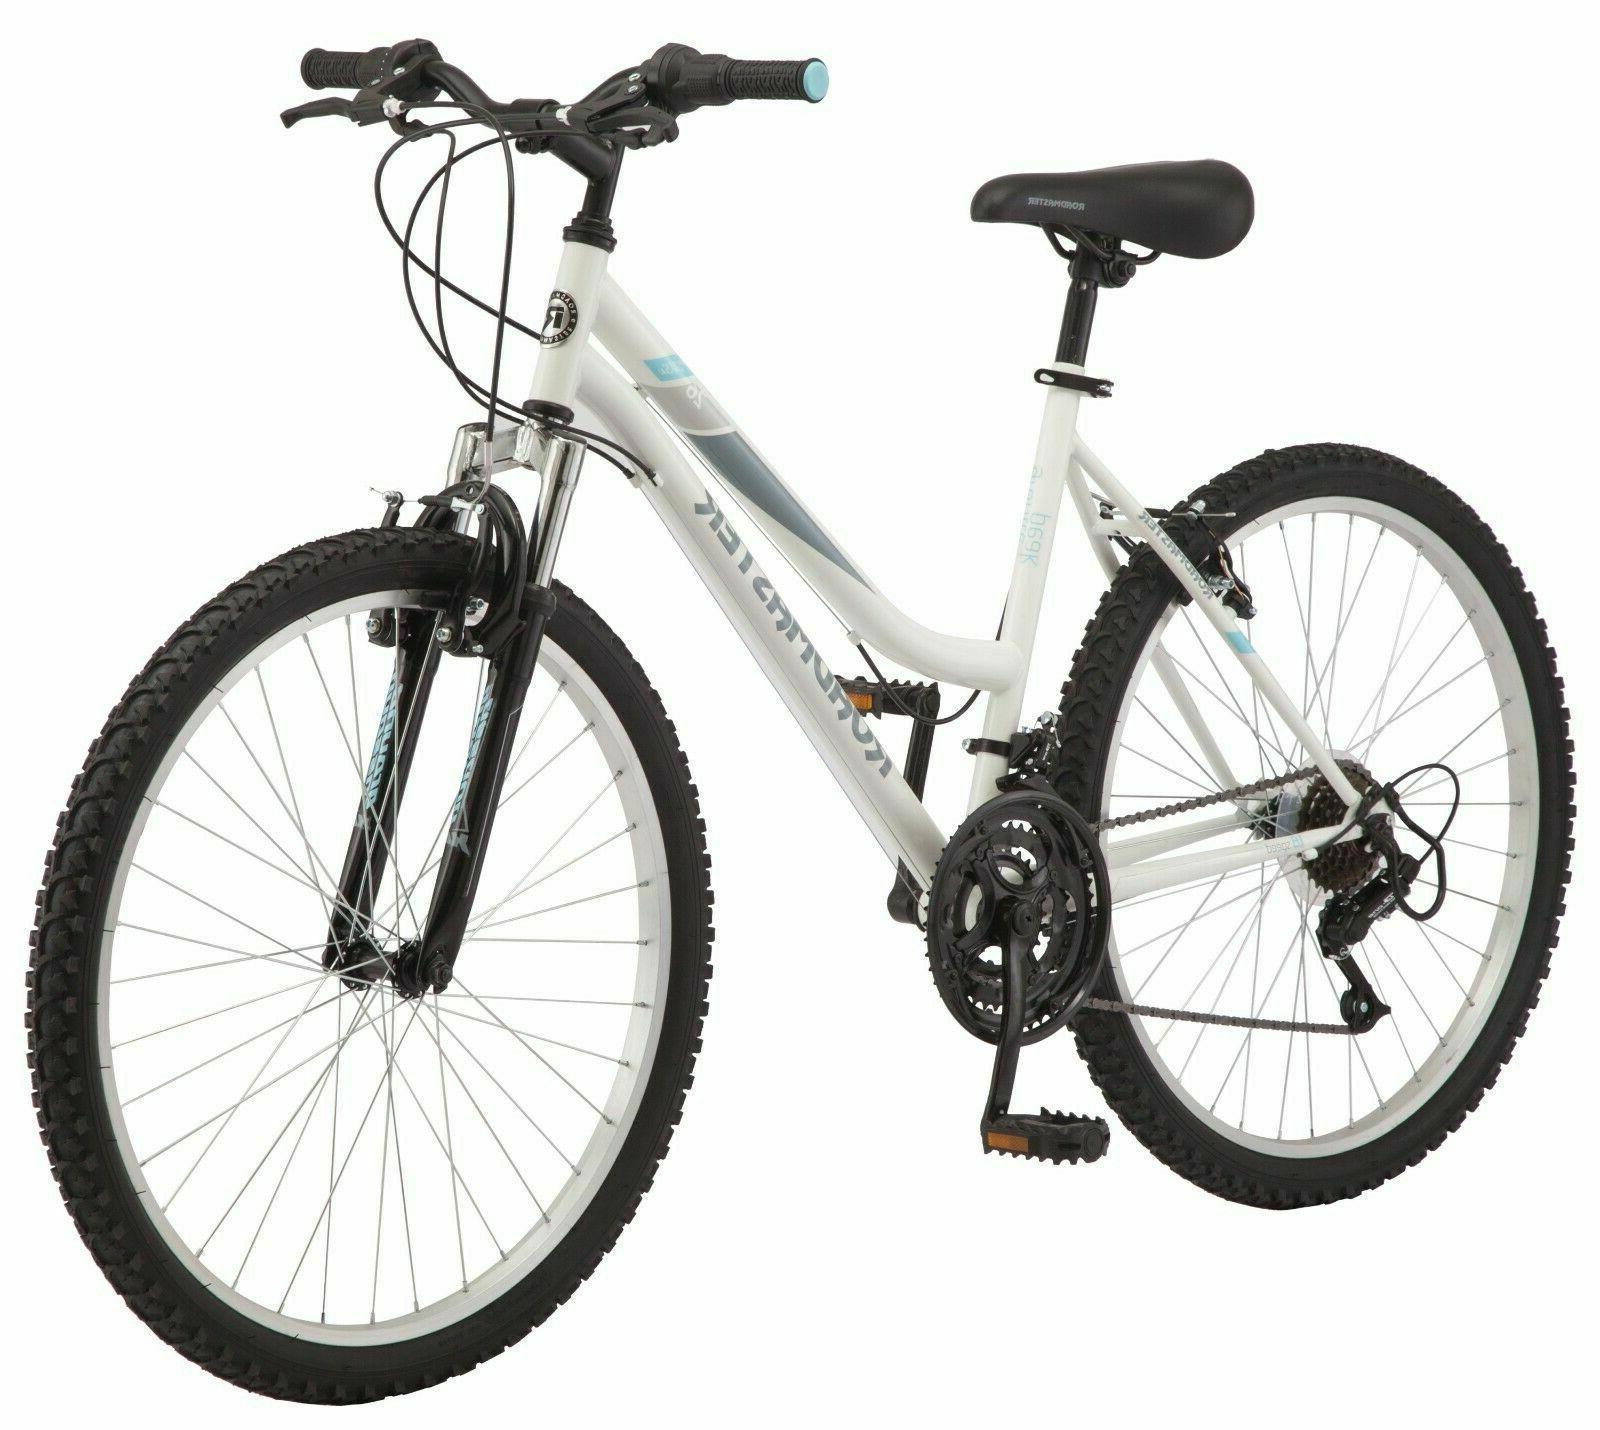 Cube 2014 AMS 120 HPA 29 MTB Bike | All Terrain Cycles